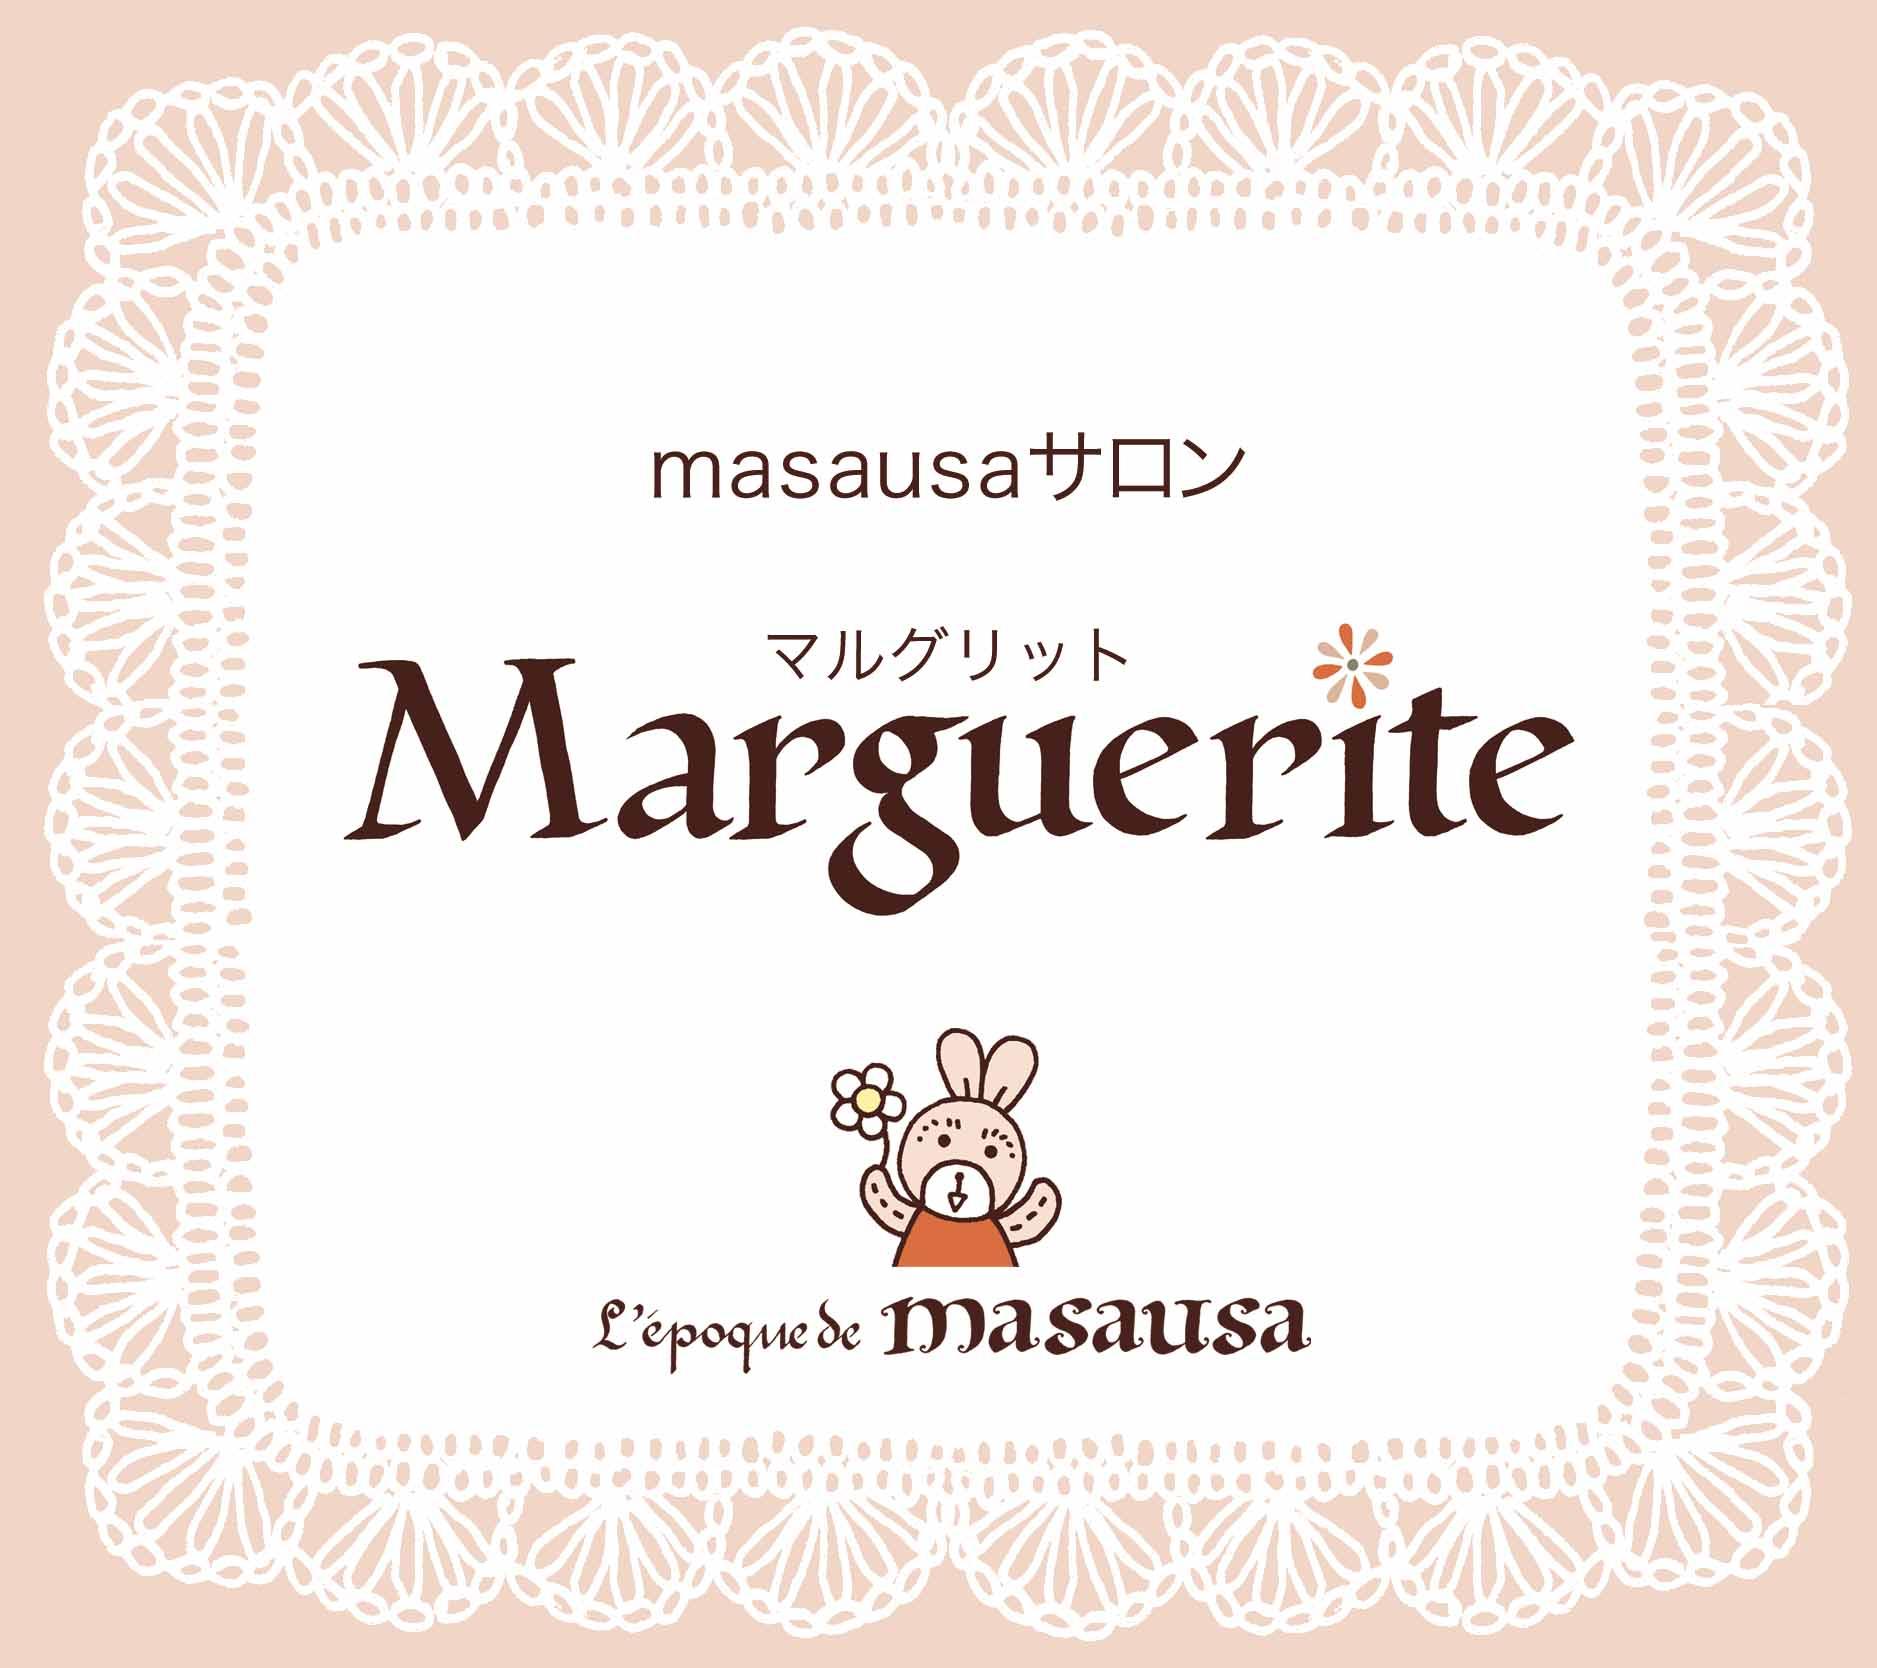 Marguerite宣伝用タイトル